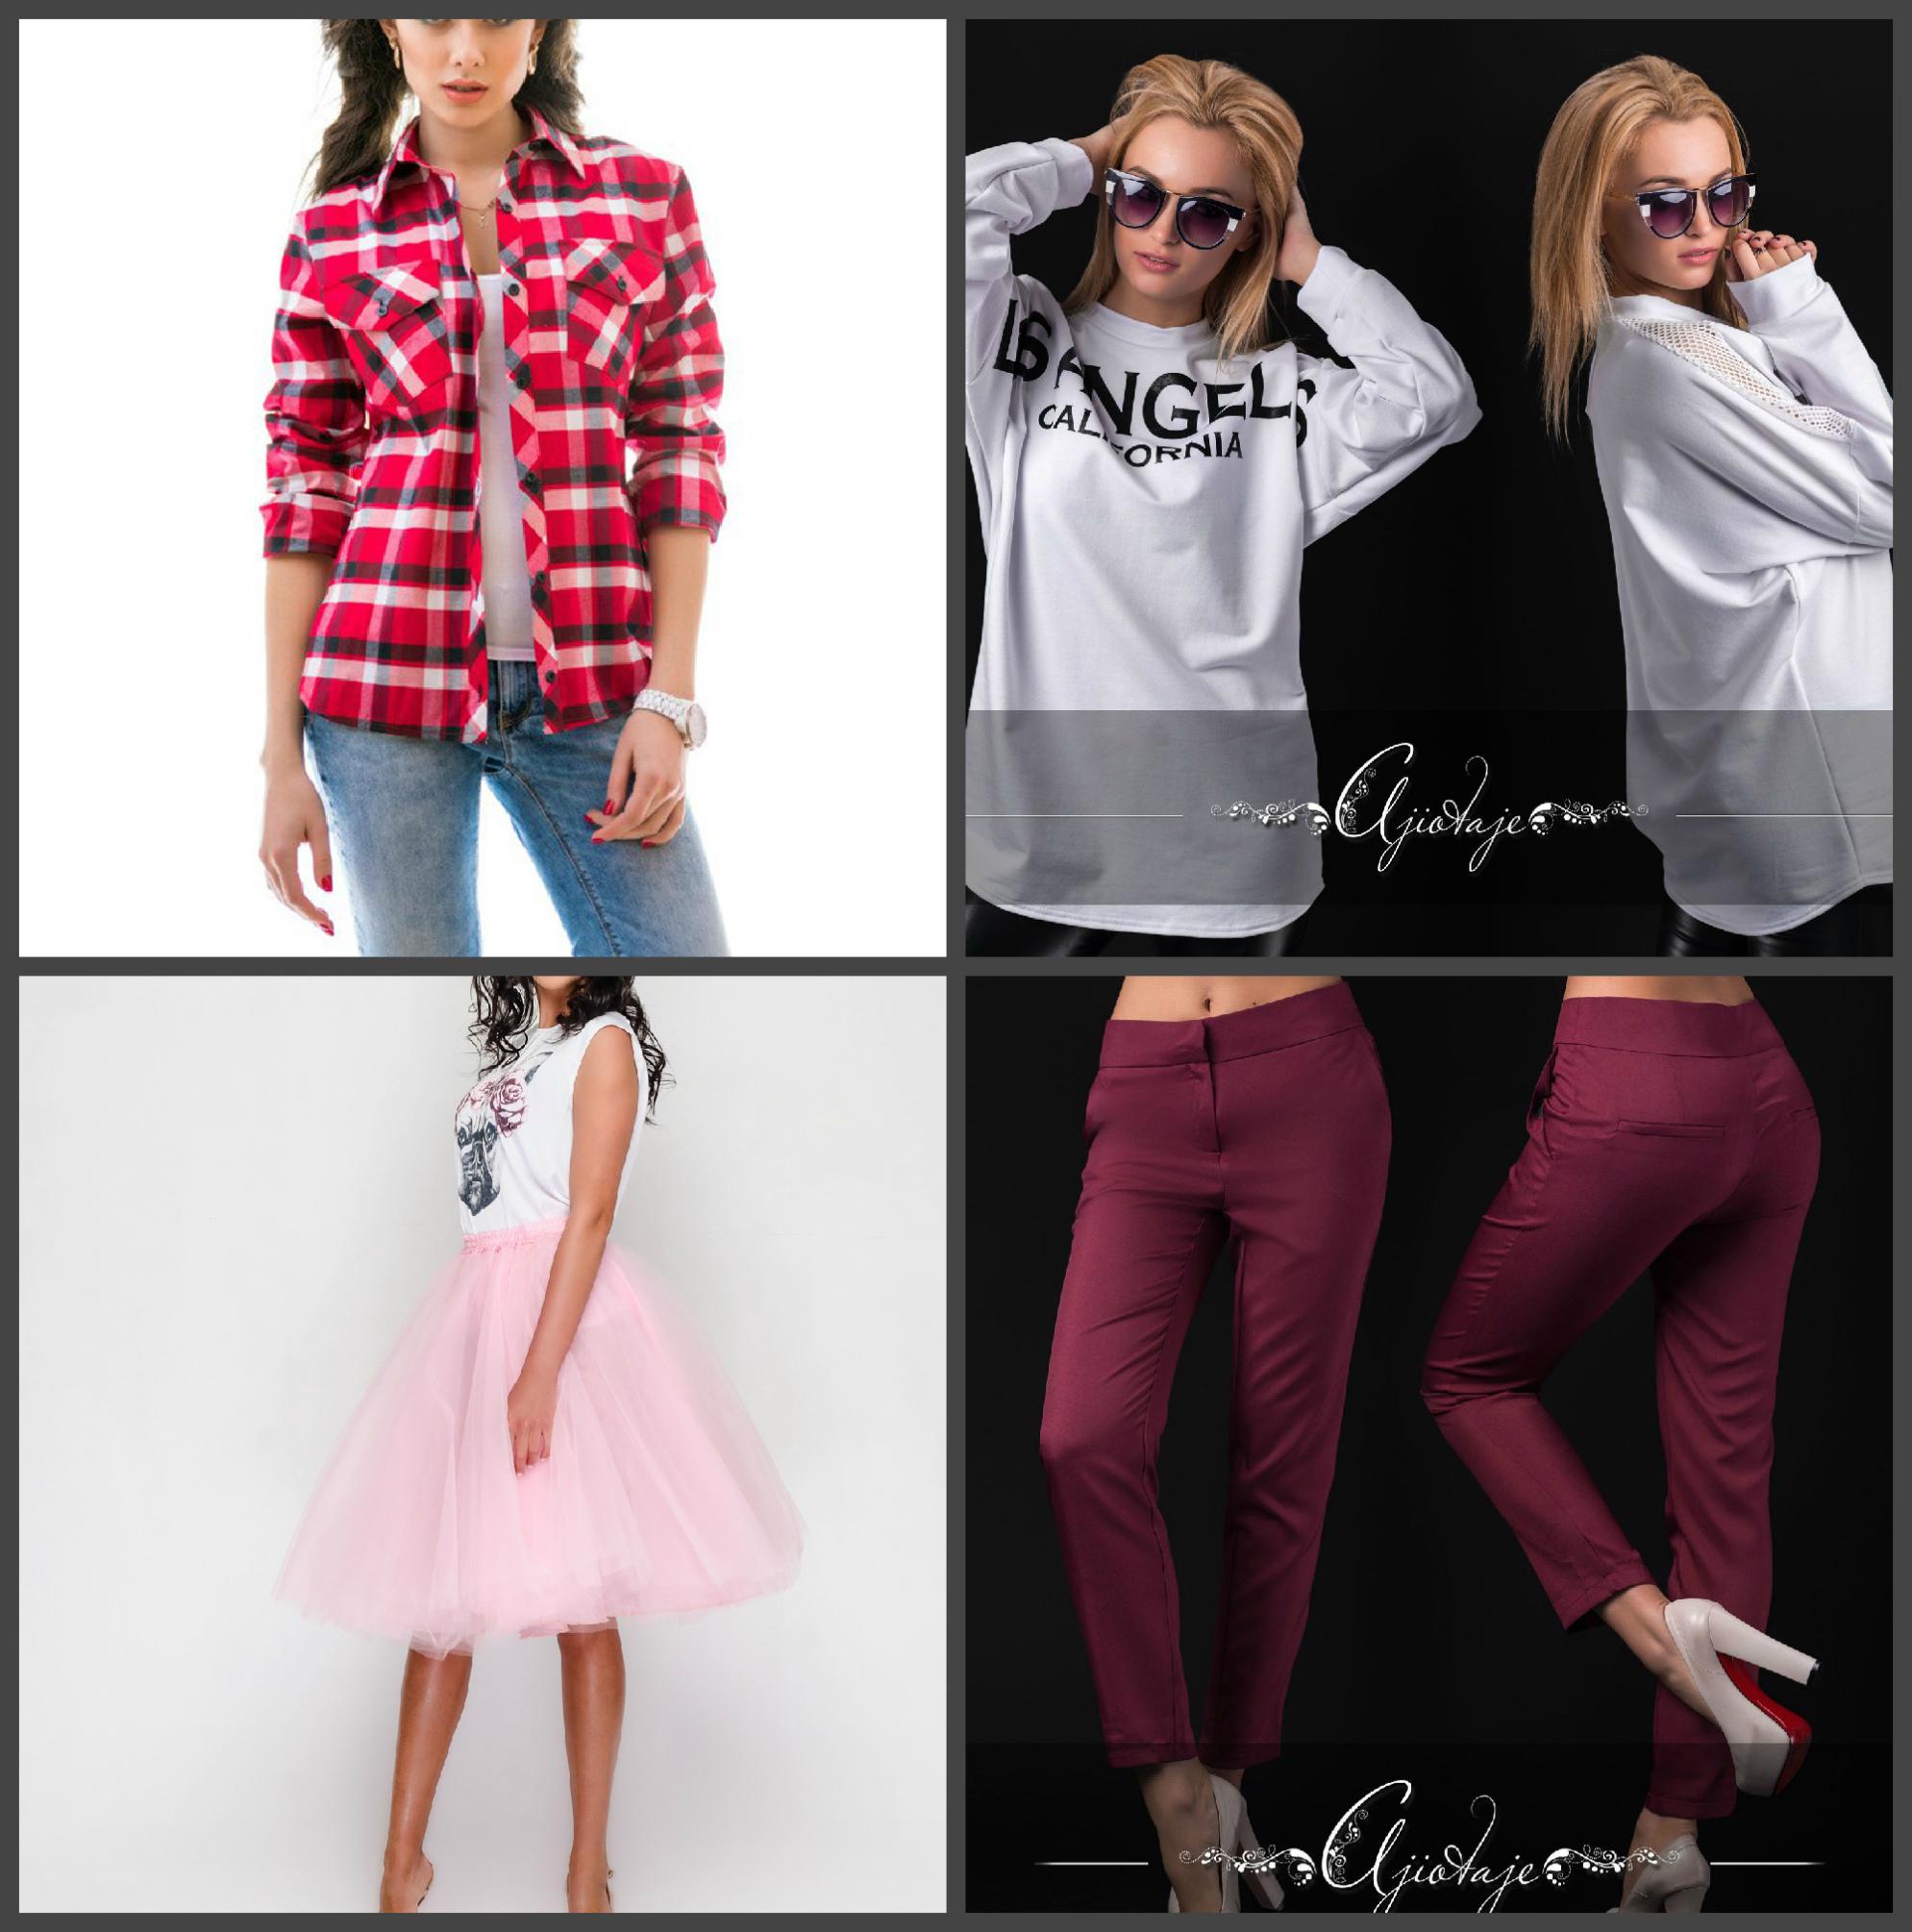 Новинки: свитшоты, лосины, брюки, юбки